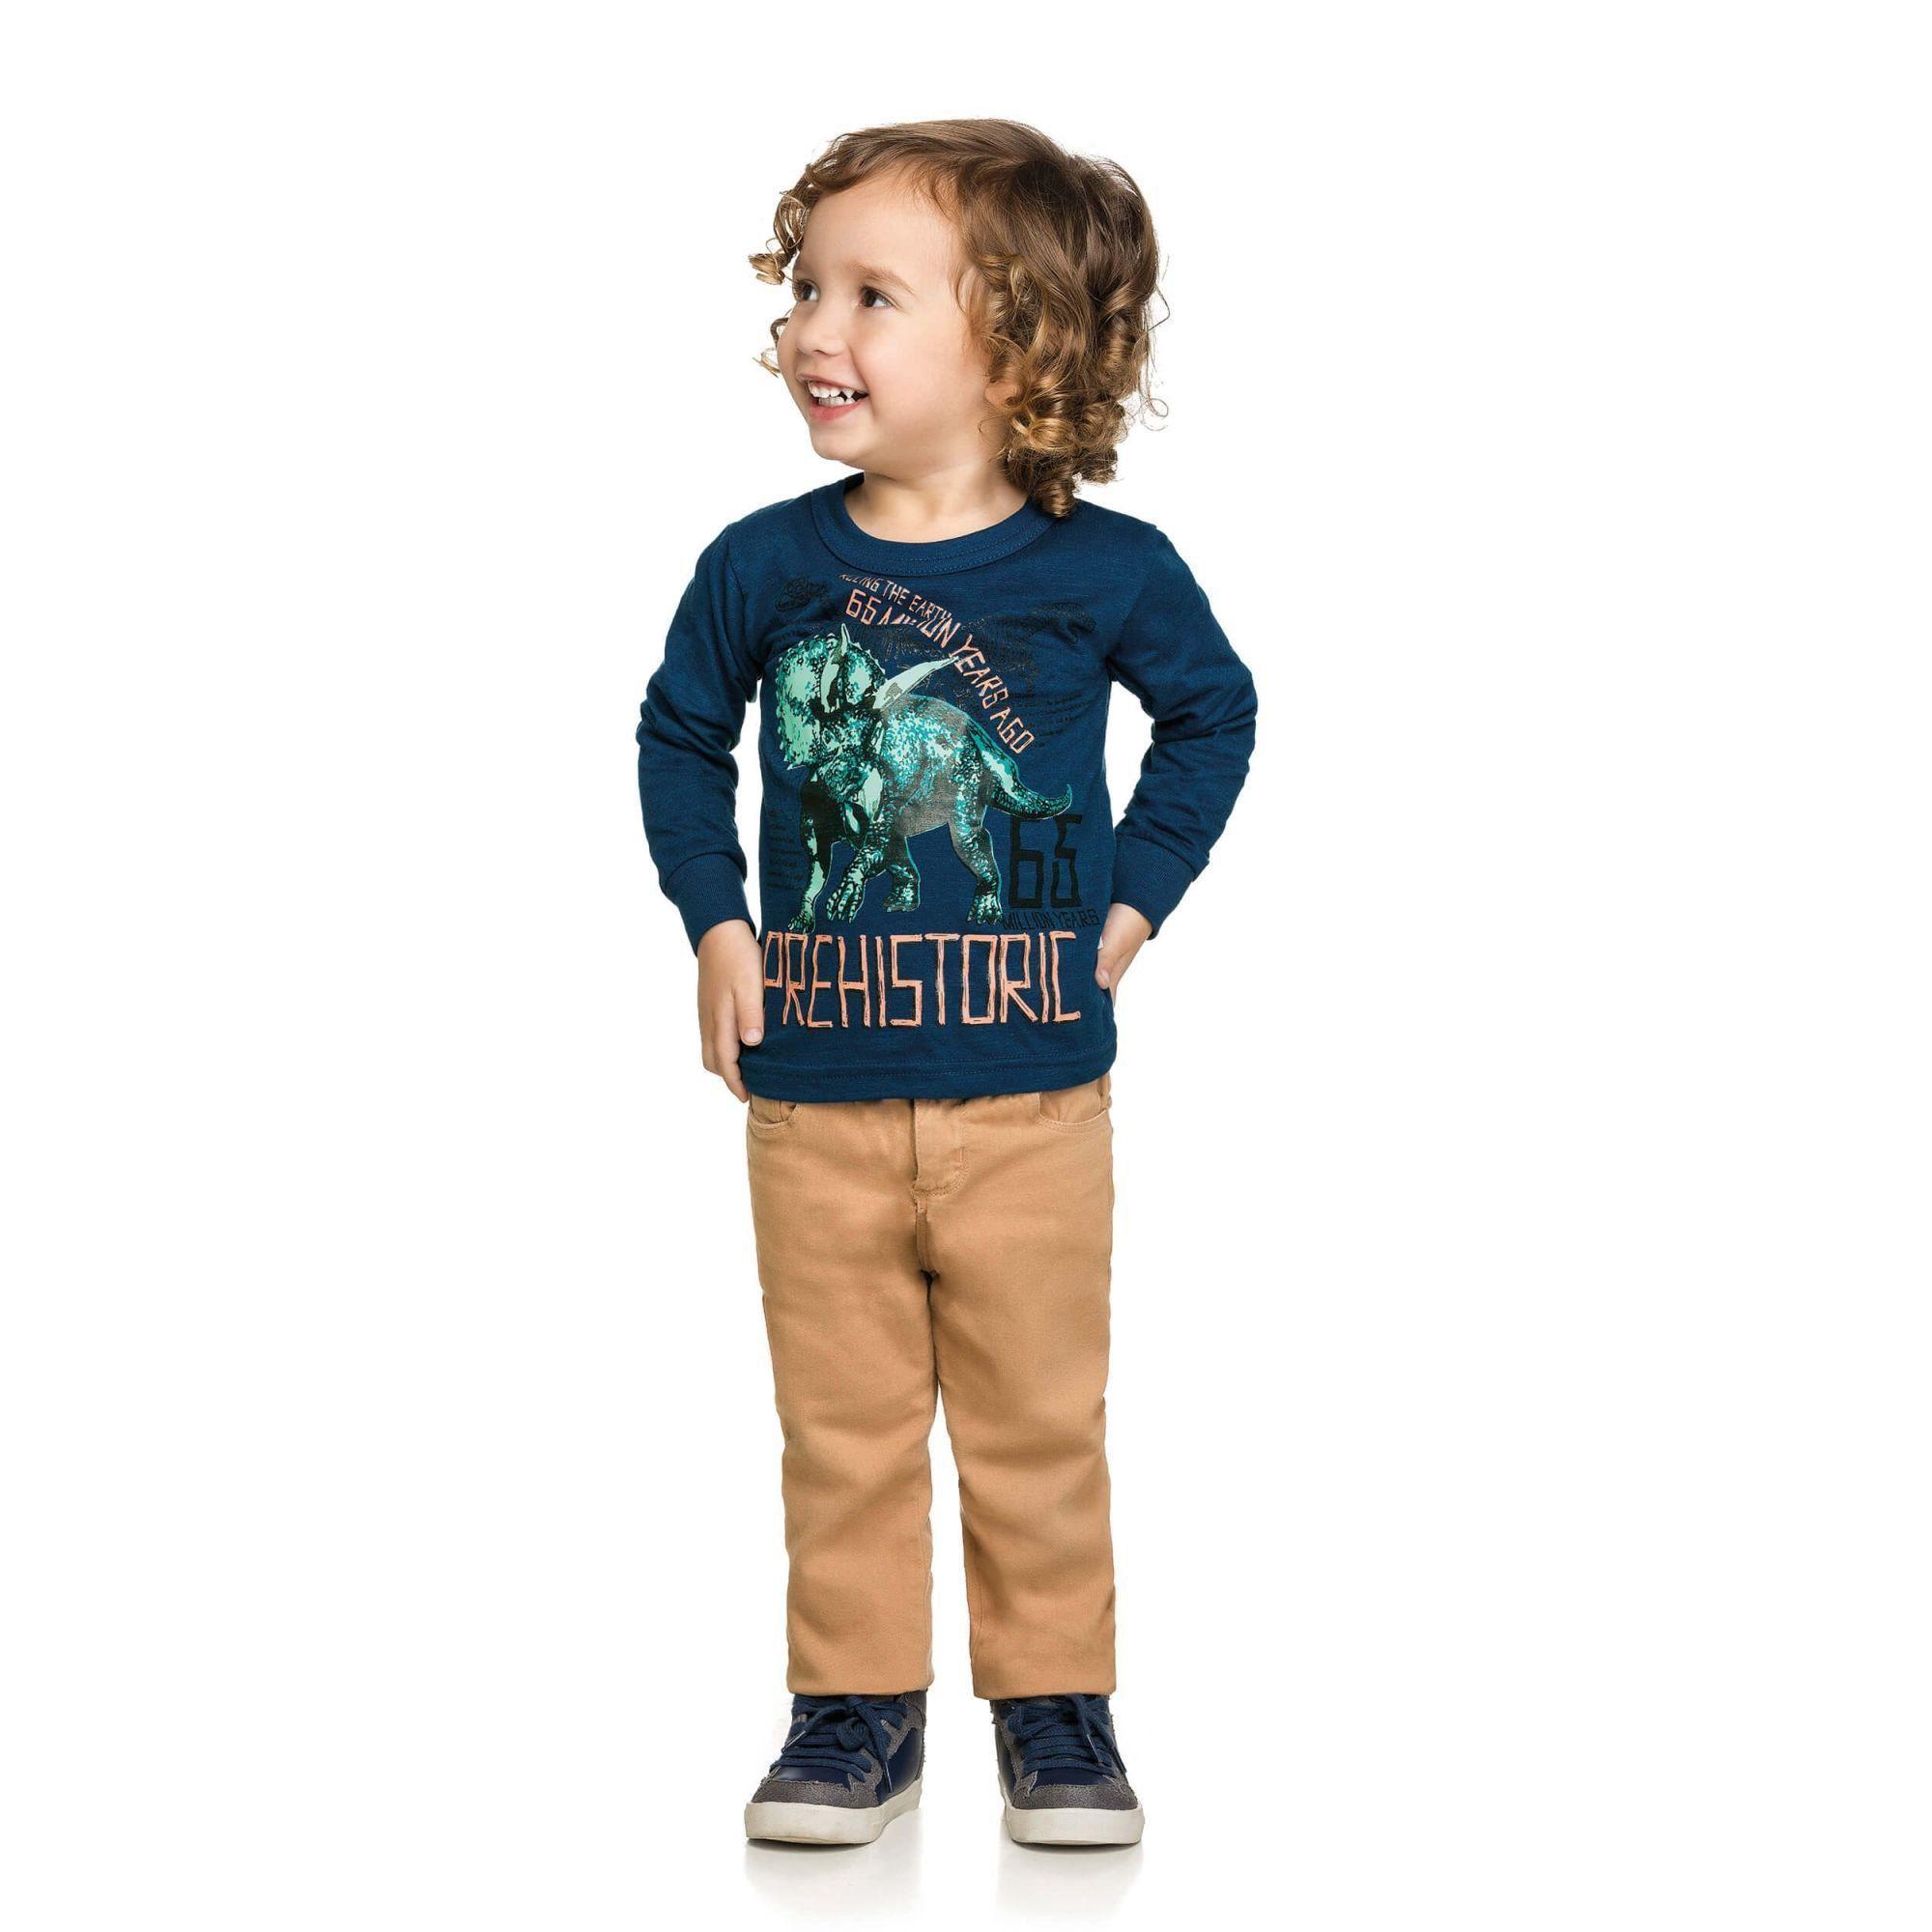 Camiseta Infantil Masculina Inverno Azul Marinho Prehistoric Elian